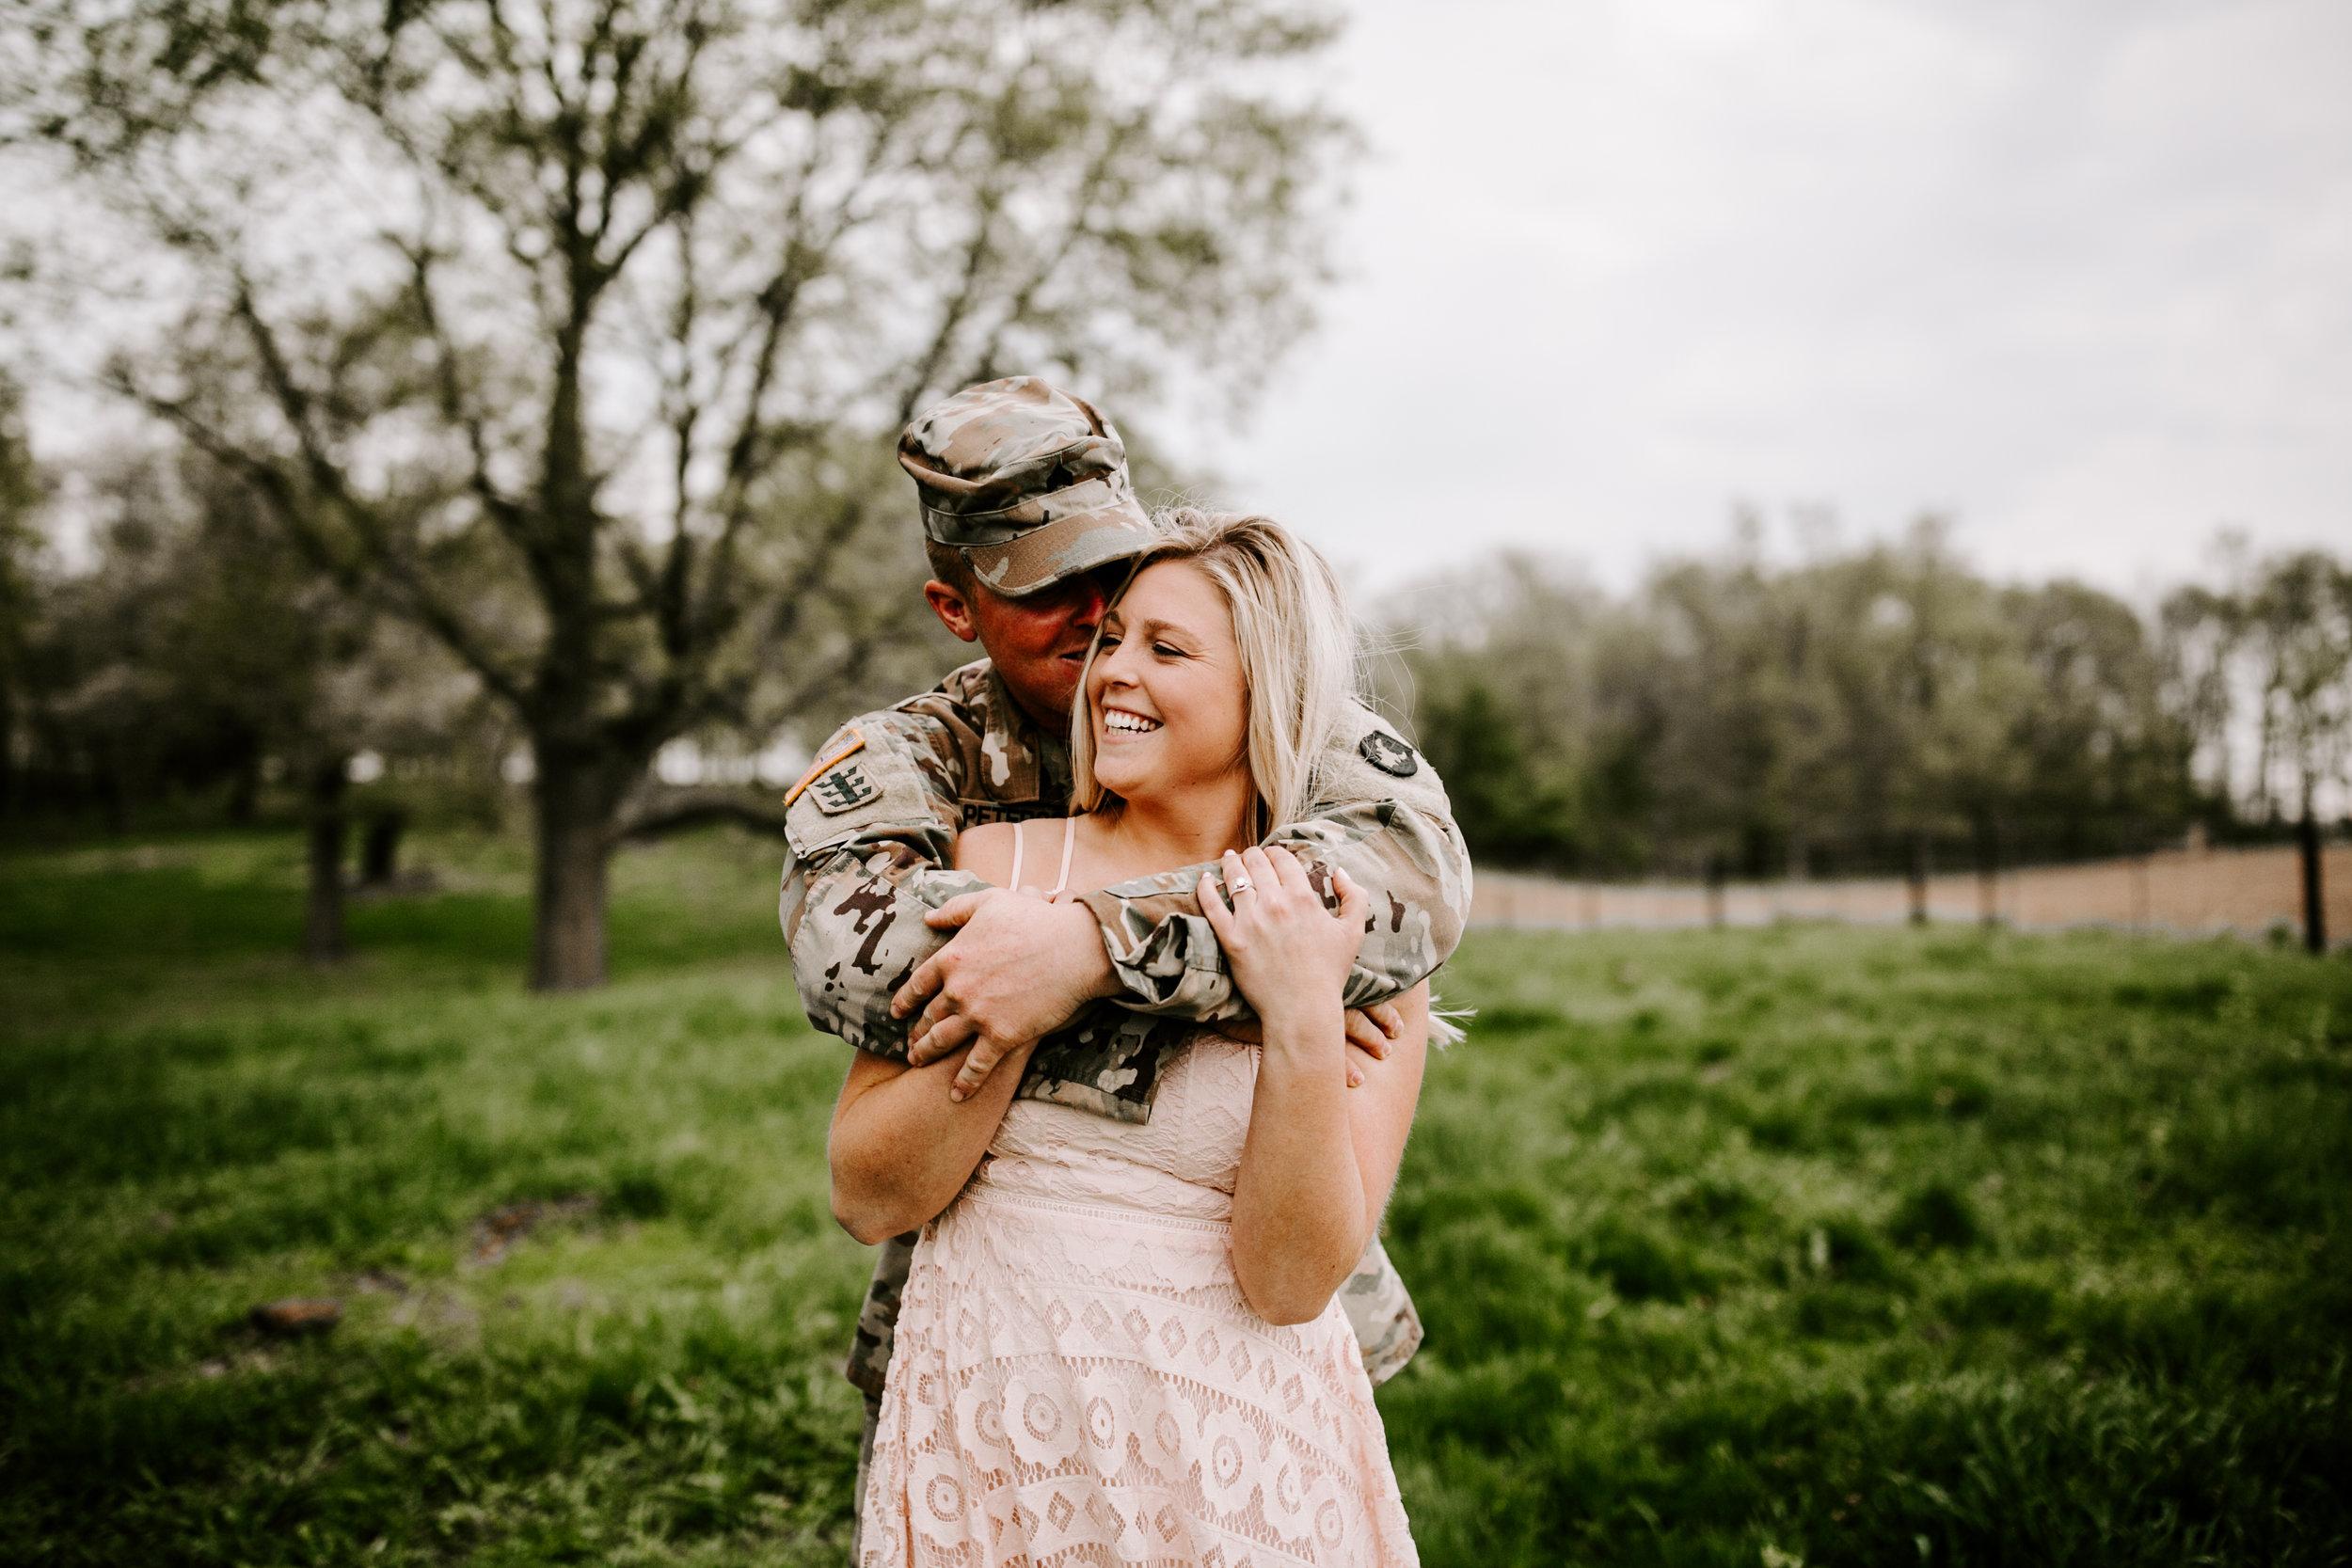 gracetphotography-wedding-photographer-adventure-bride-engagement-33.jpg